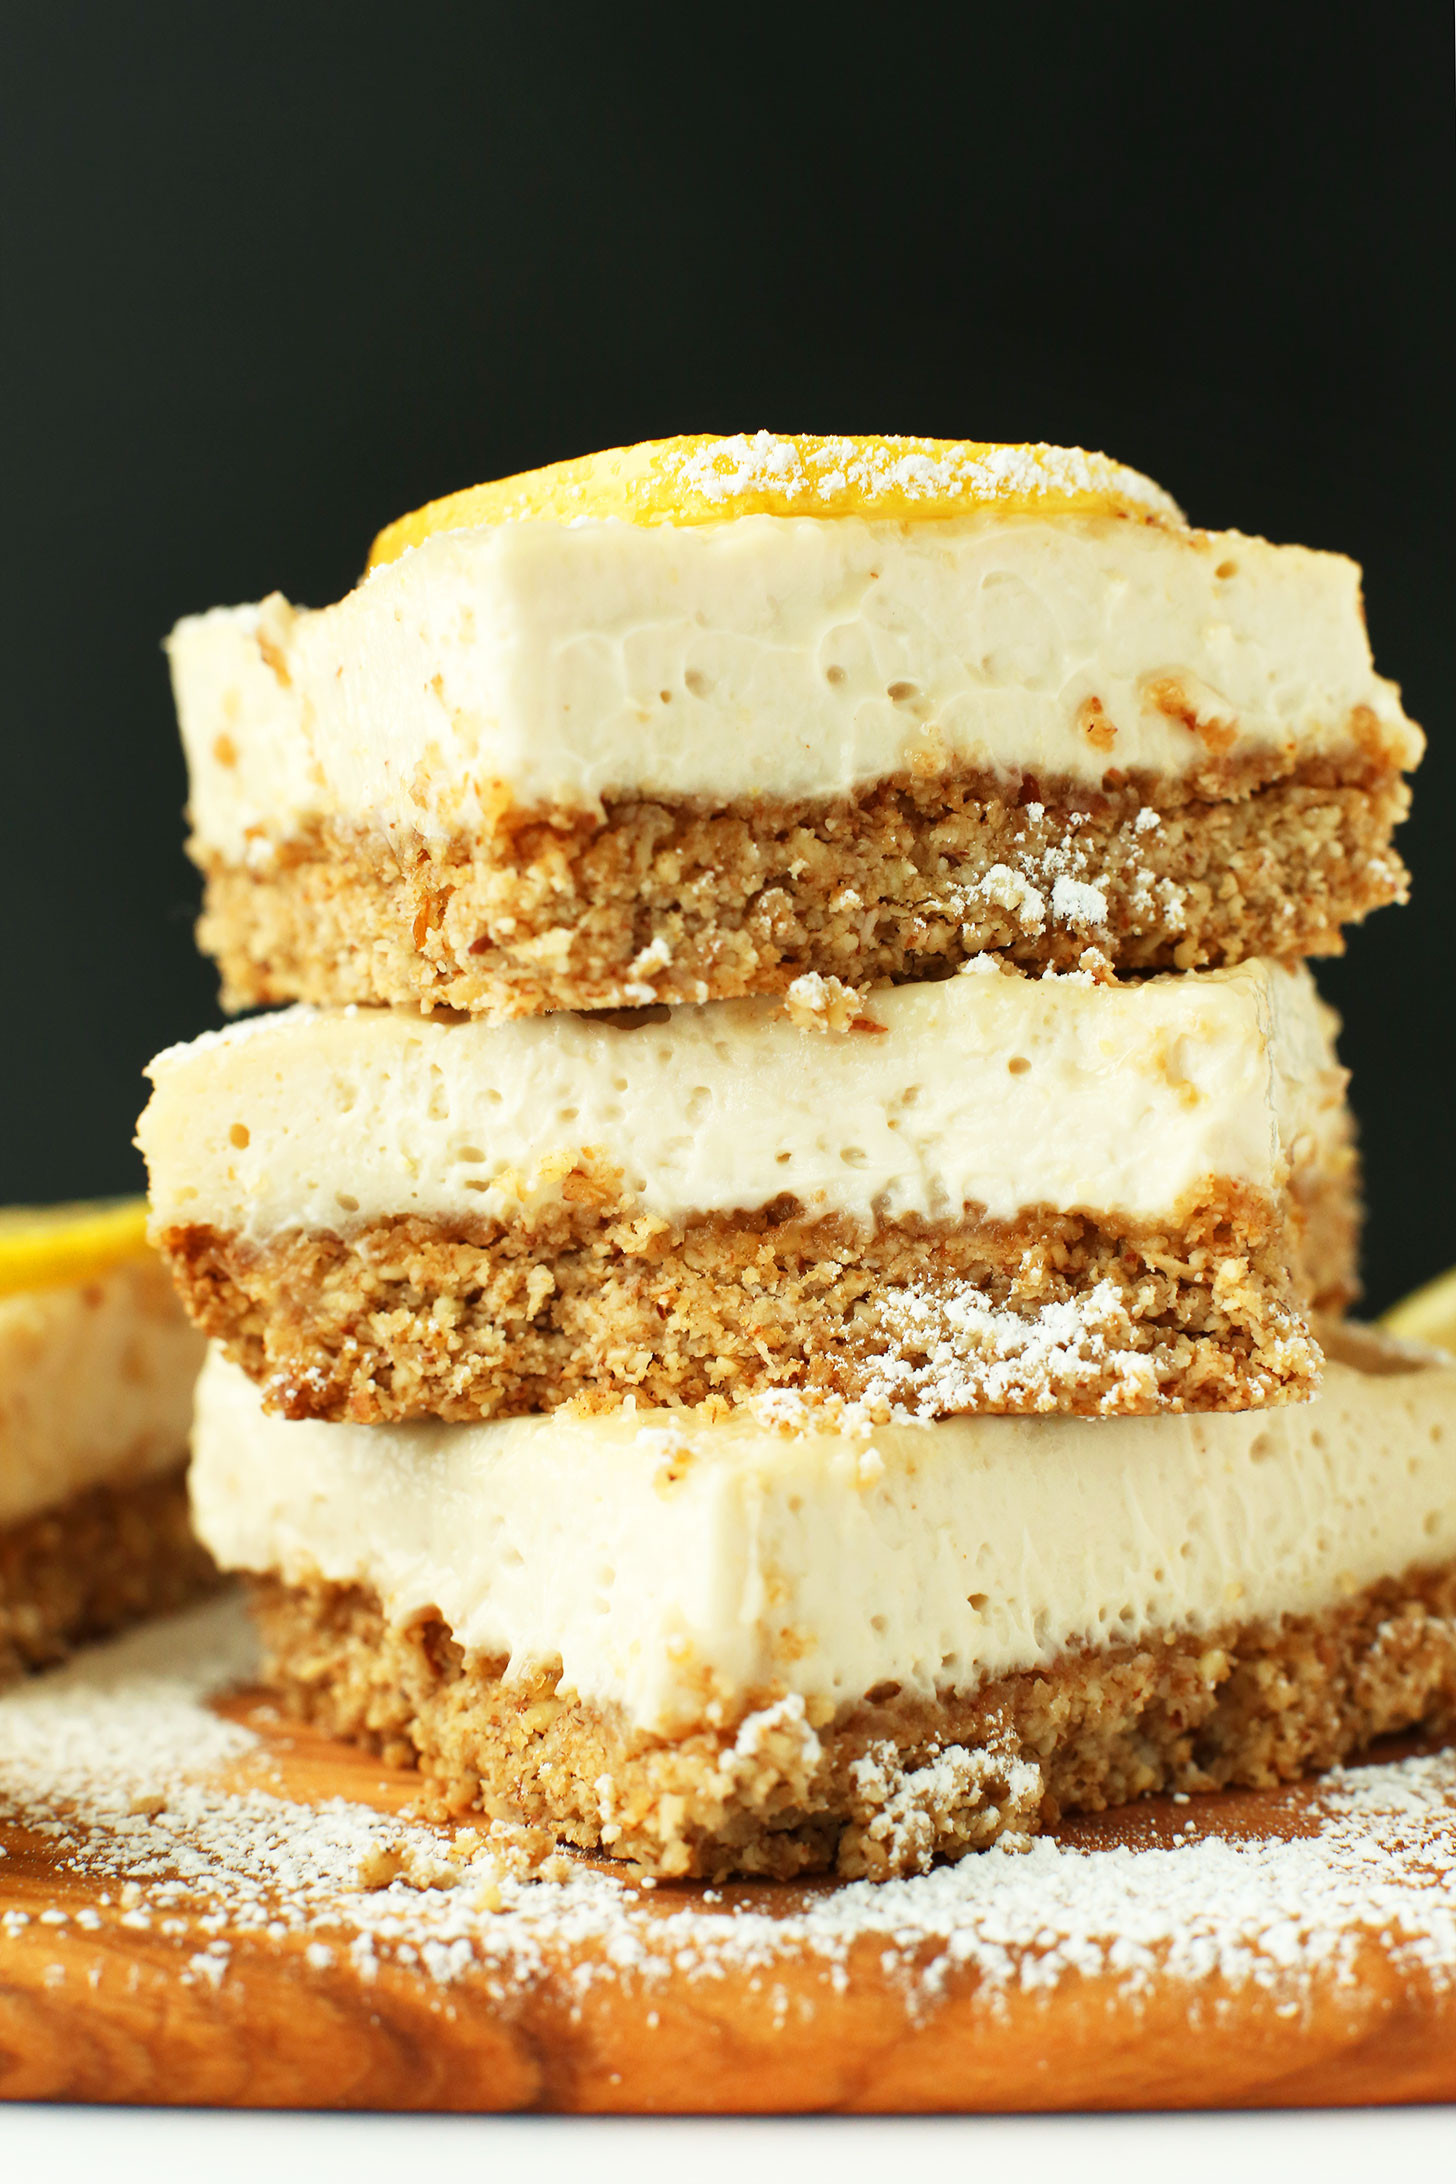 Healthy Vegan Cake Recipes  Creamy Vegan Lemon Bars GF